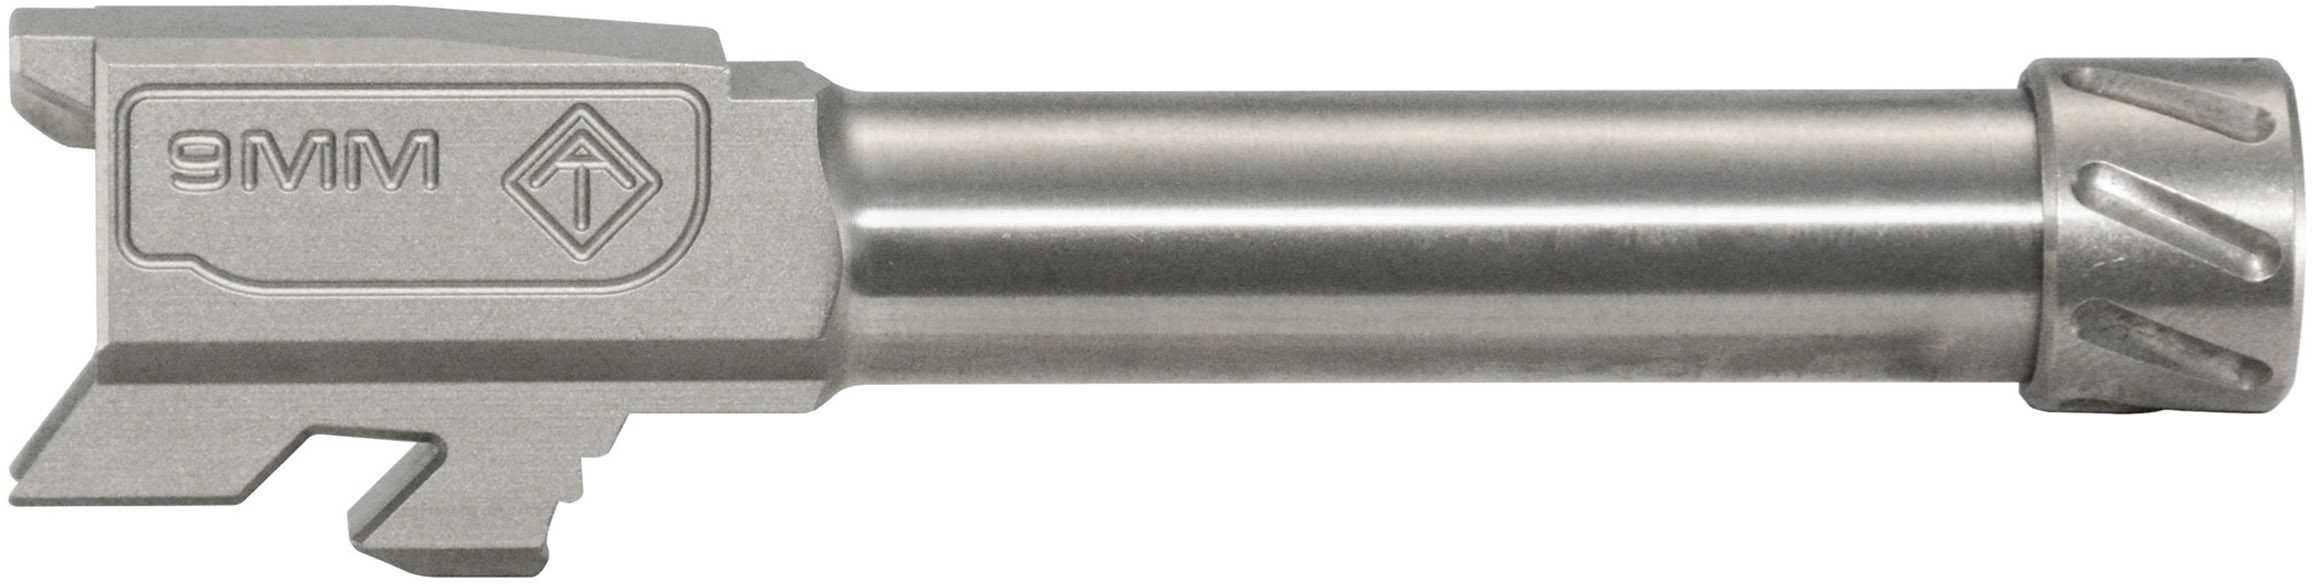 American Tactical Imports American Tactical Match Grade Drop-In Threaded Barrel, Glock 43 9mm Md: ATIBG43T